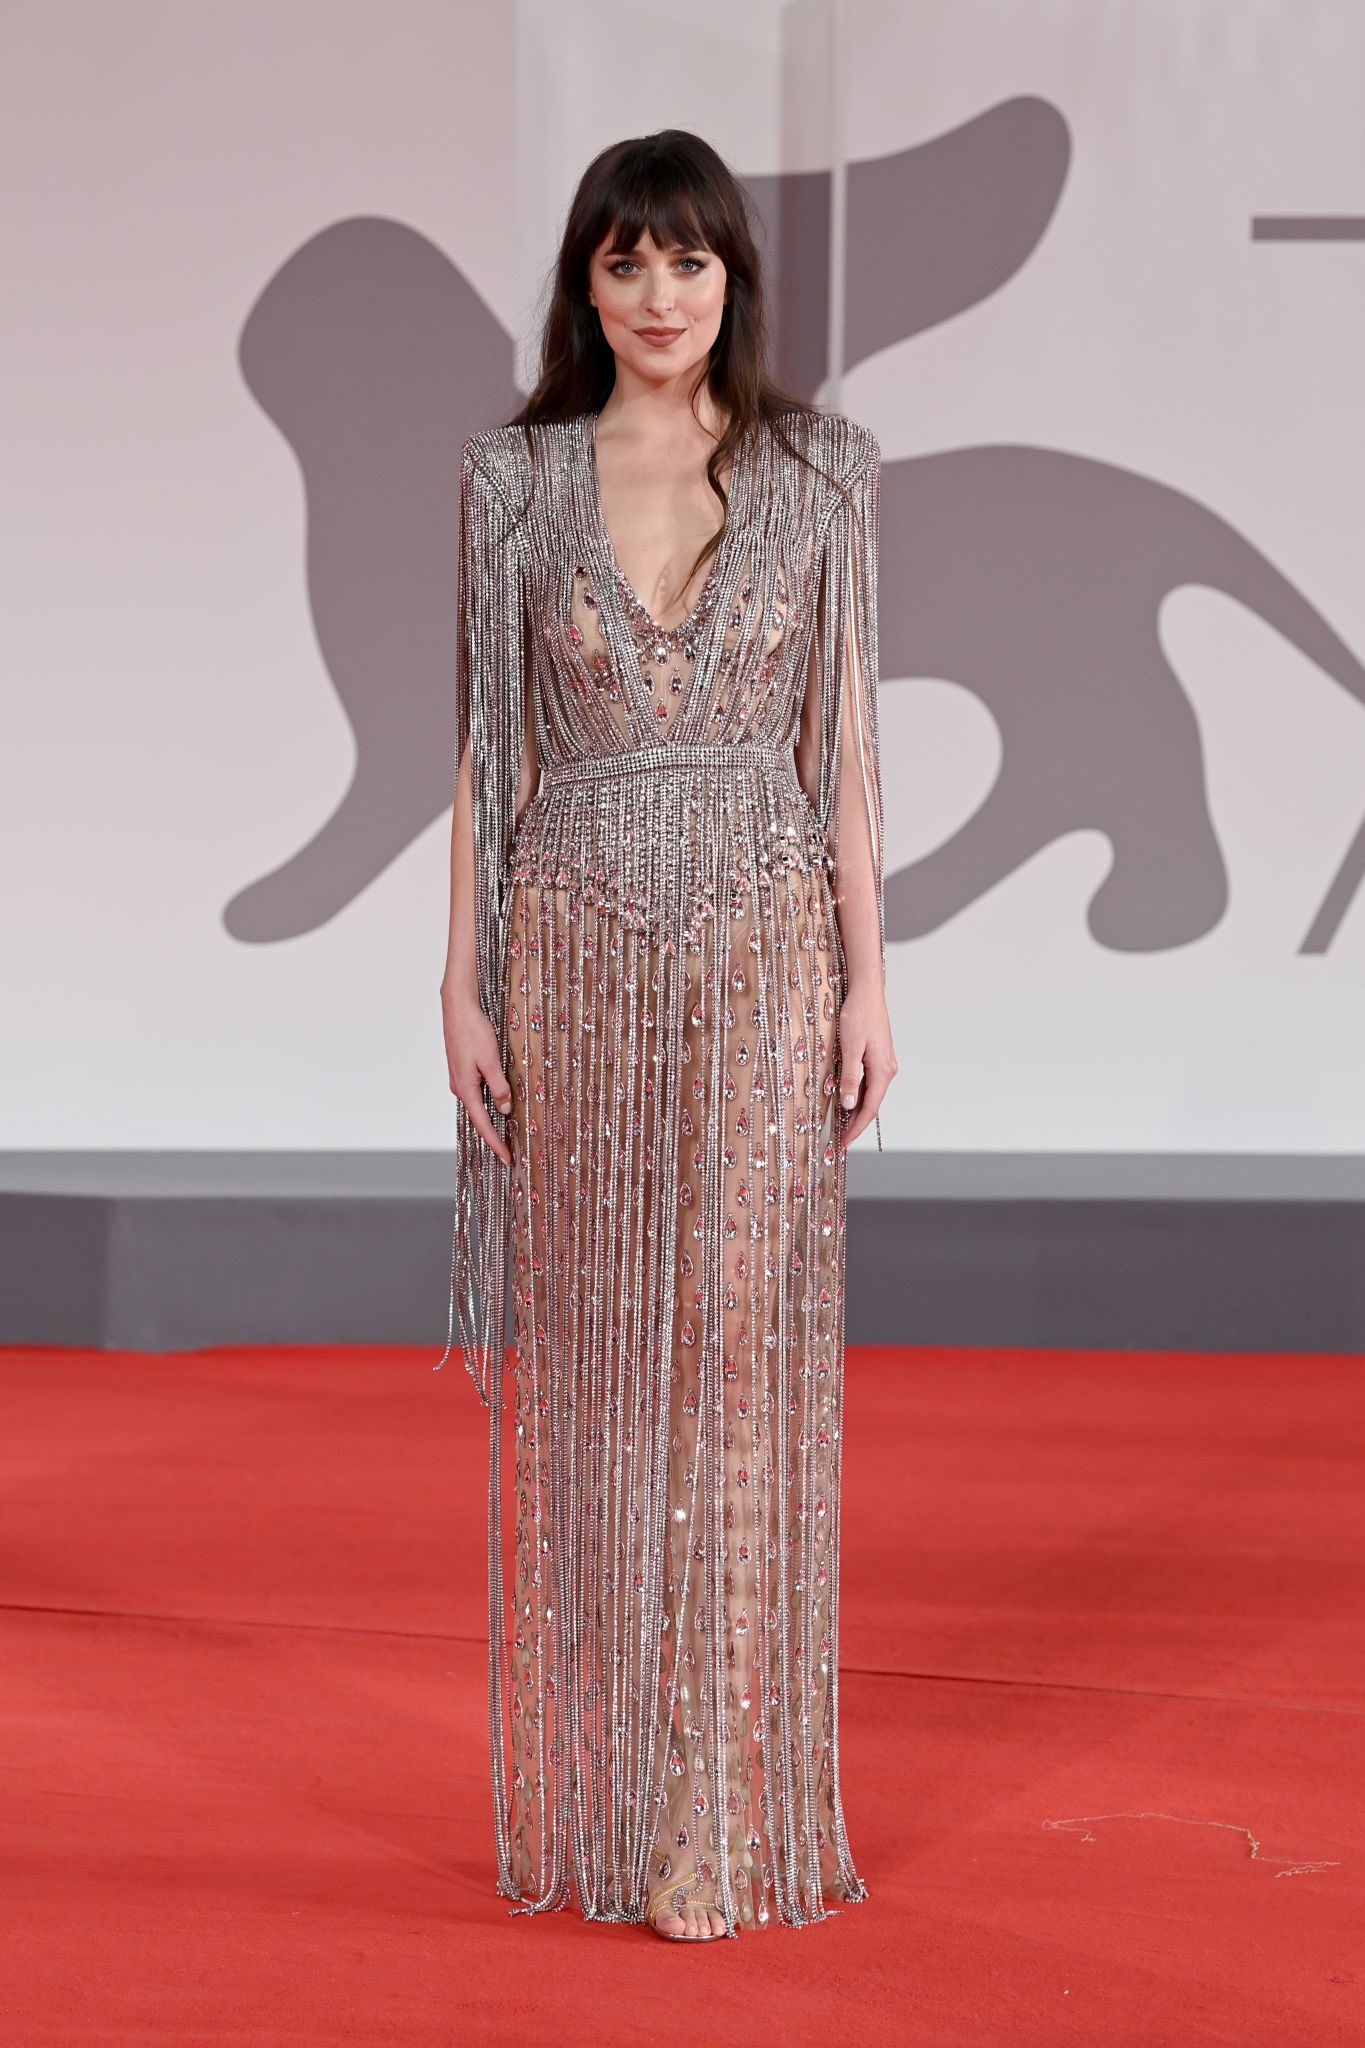 Dakota Johnson wowed in a sheer dress at her Venice Film Festival premiere